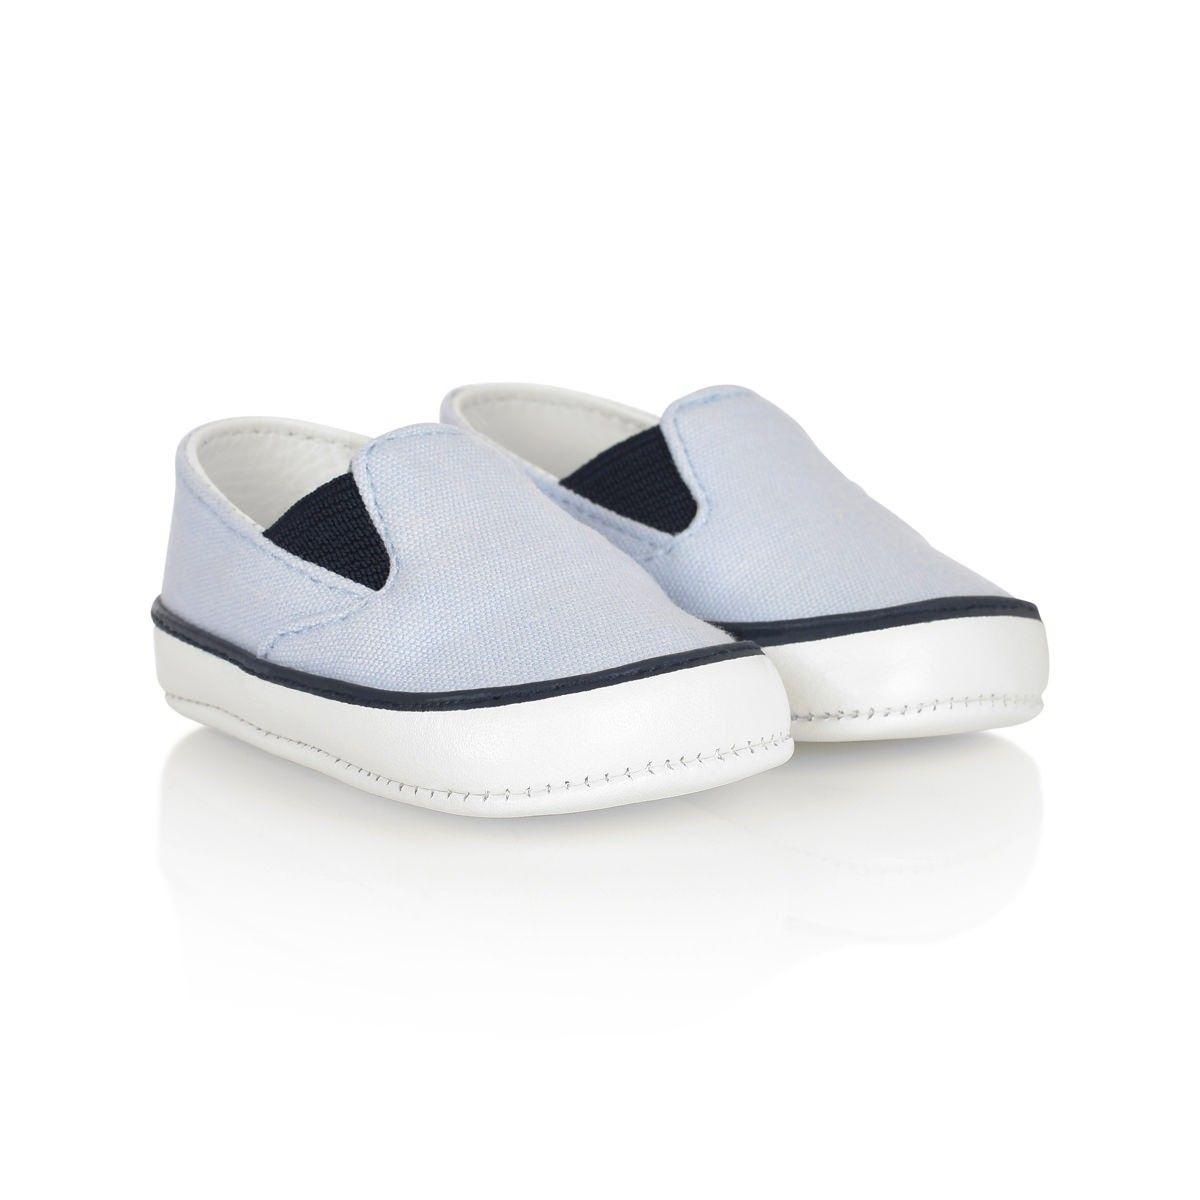 40d0ff068518 BOSS Baby Boys Pale Blue Canvas Slip On Pre Walker Shoes